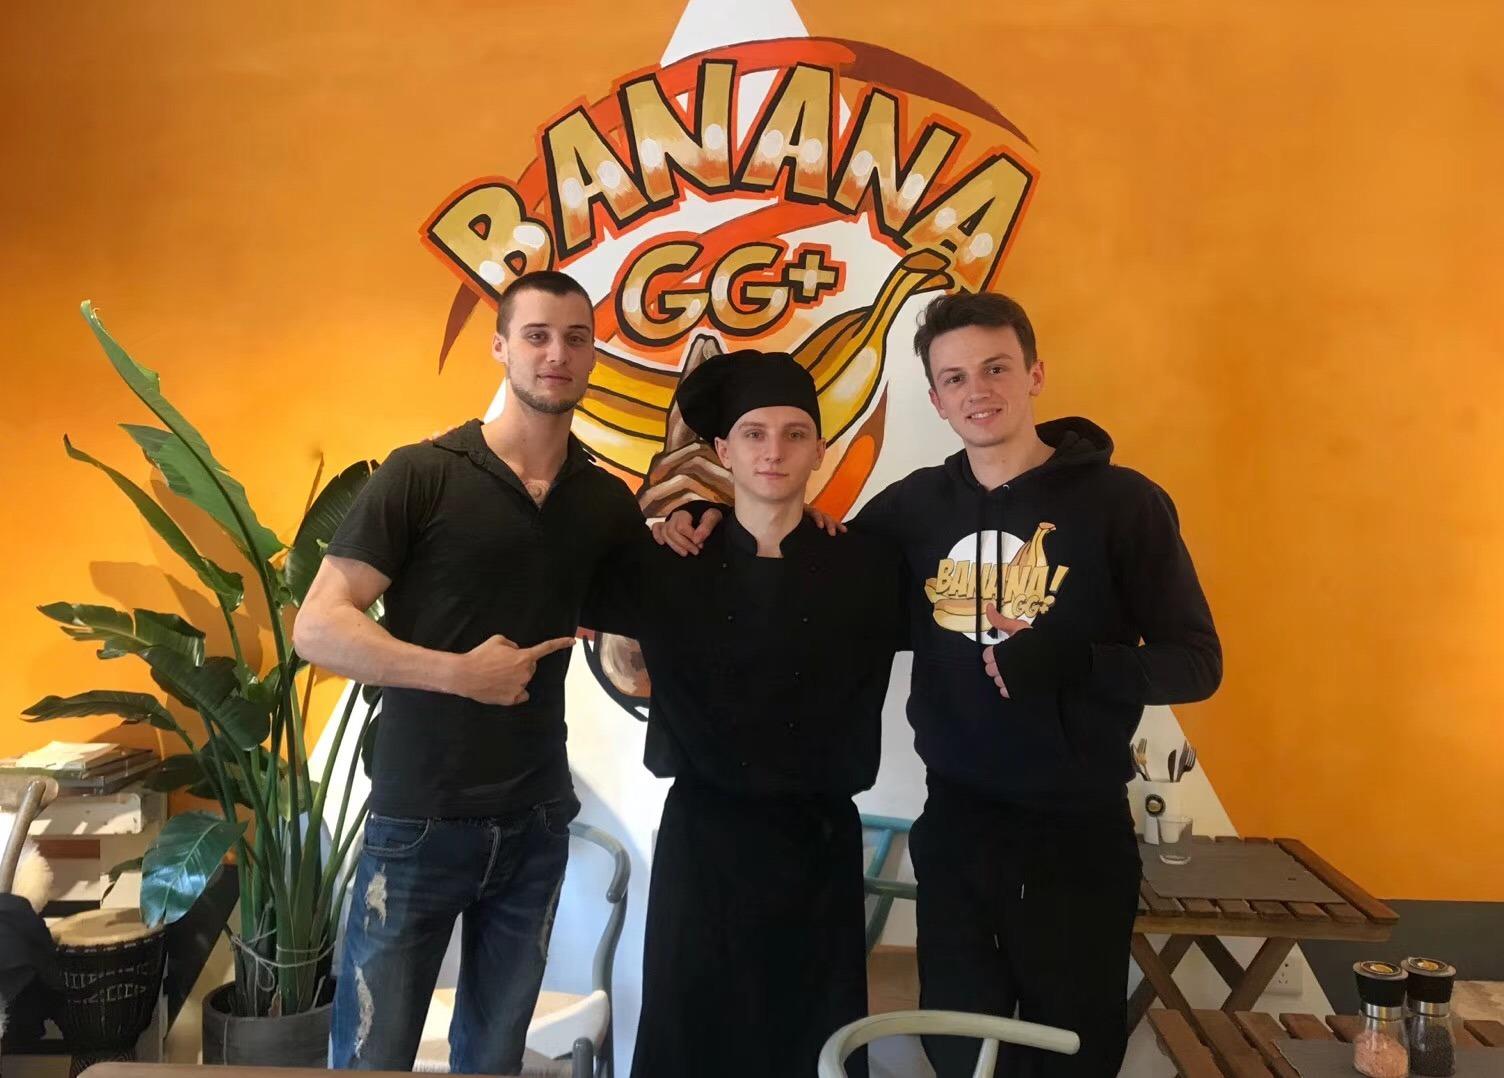 Партнеры Banana GG